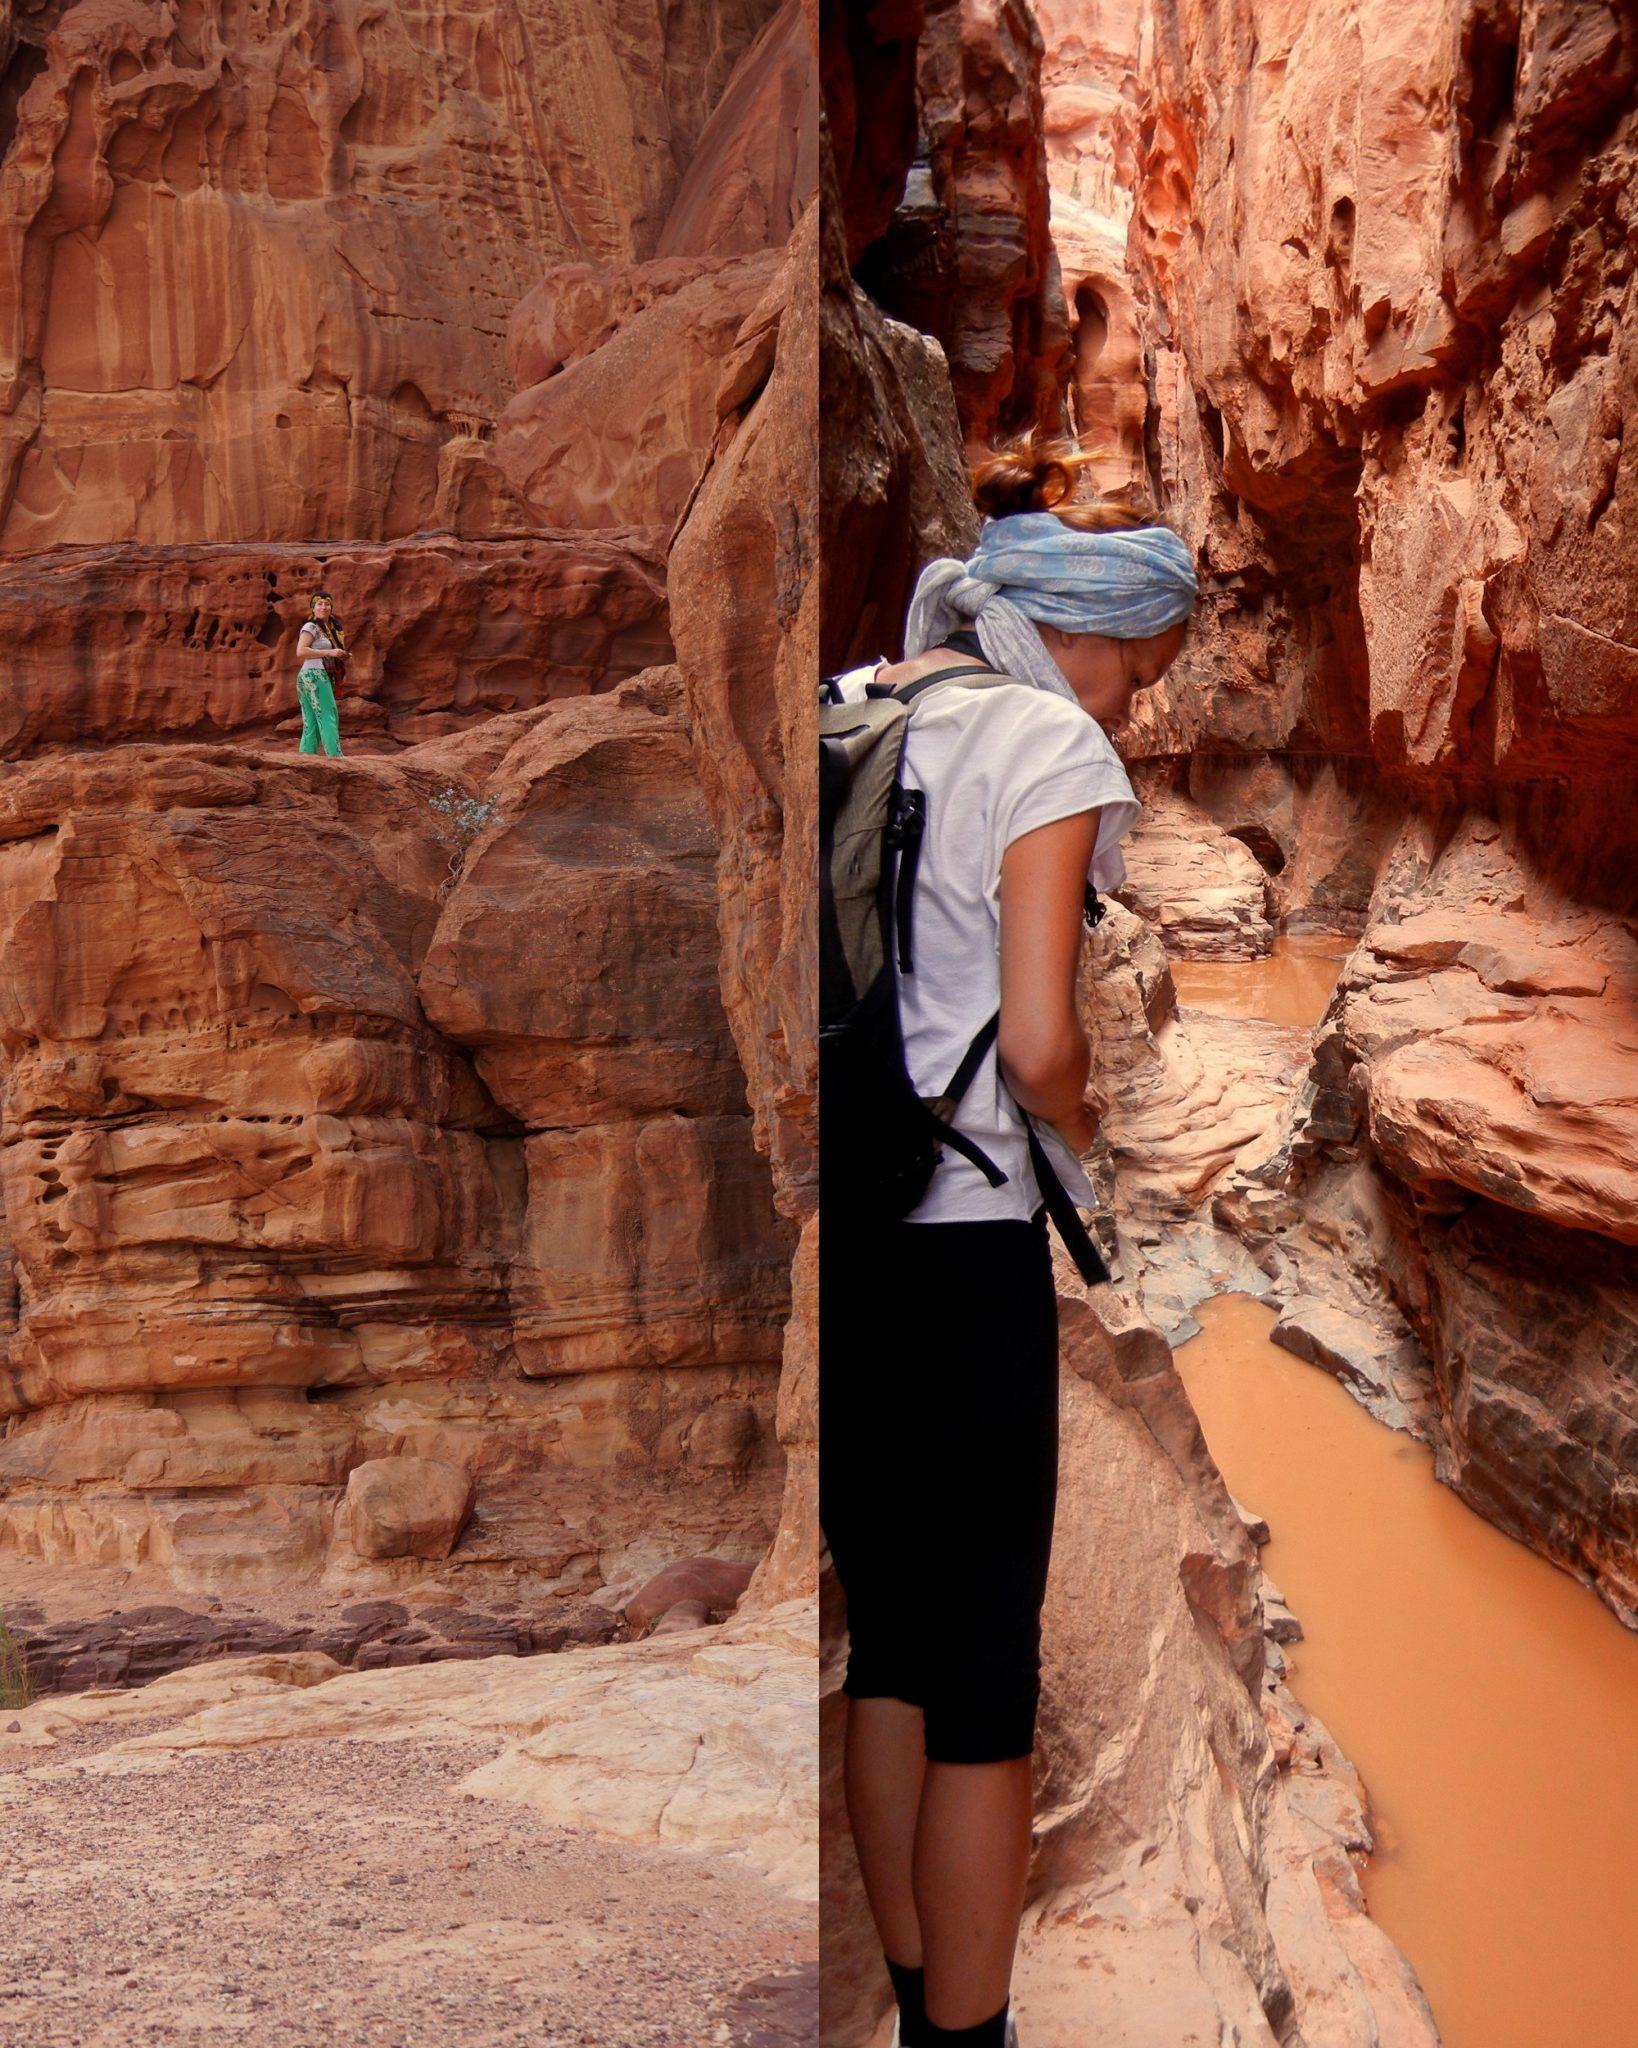 Jordánsko - Kaňon Khazali (Wadi Rum)